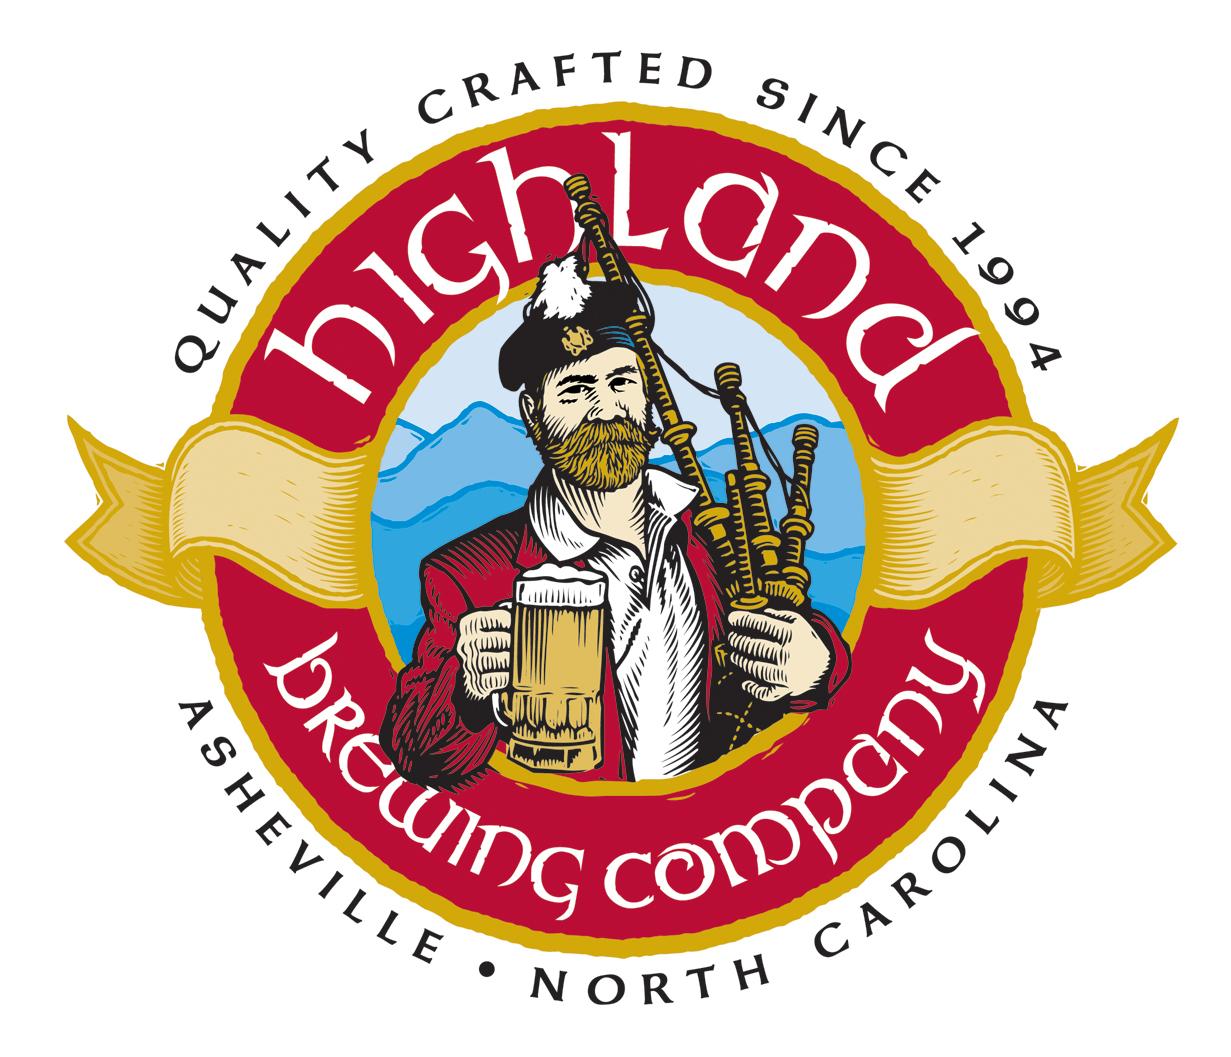 http://beerstreetjournal.com/wp-content/uploads/Highland-Brewing-Logo1.jpg